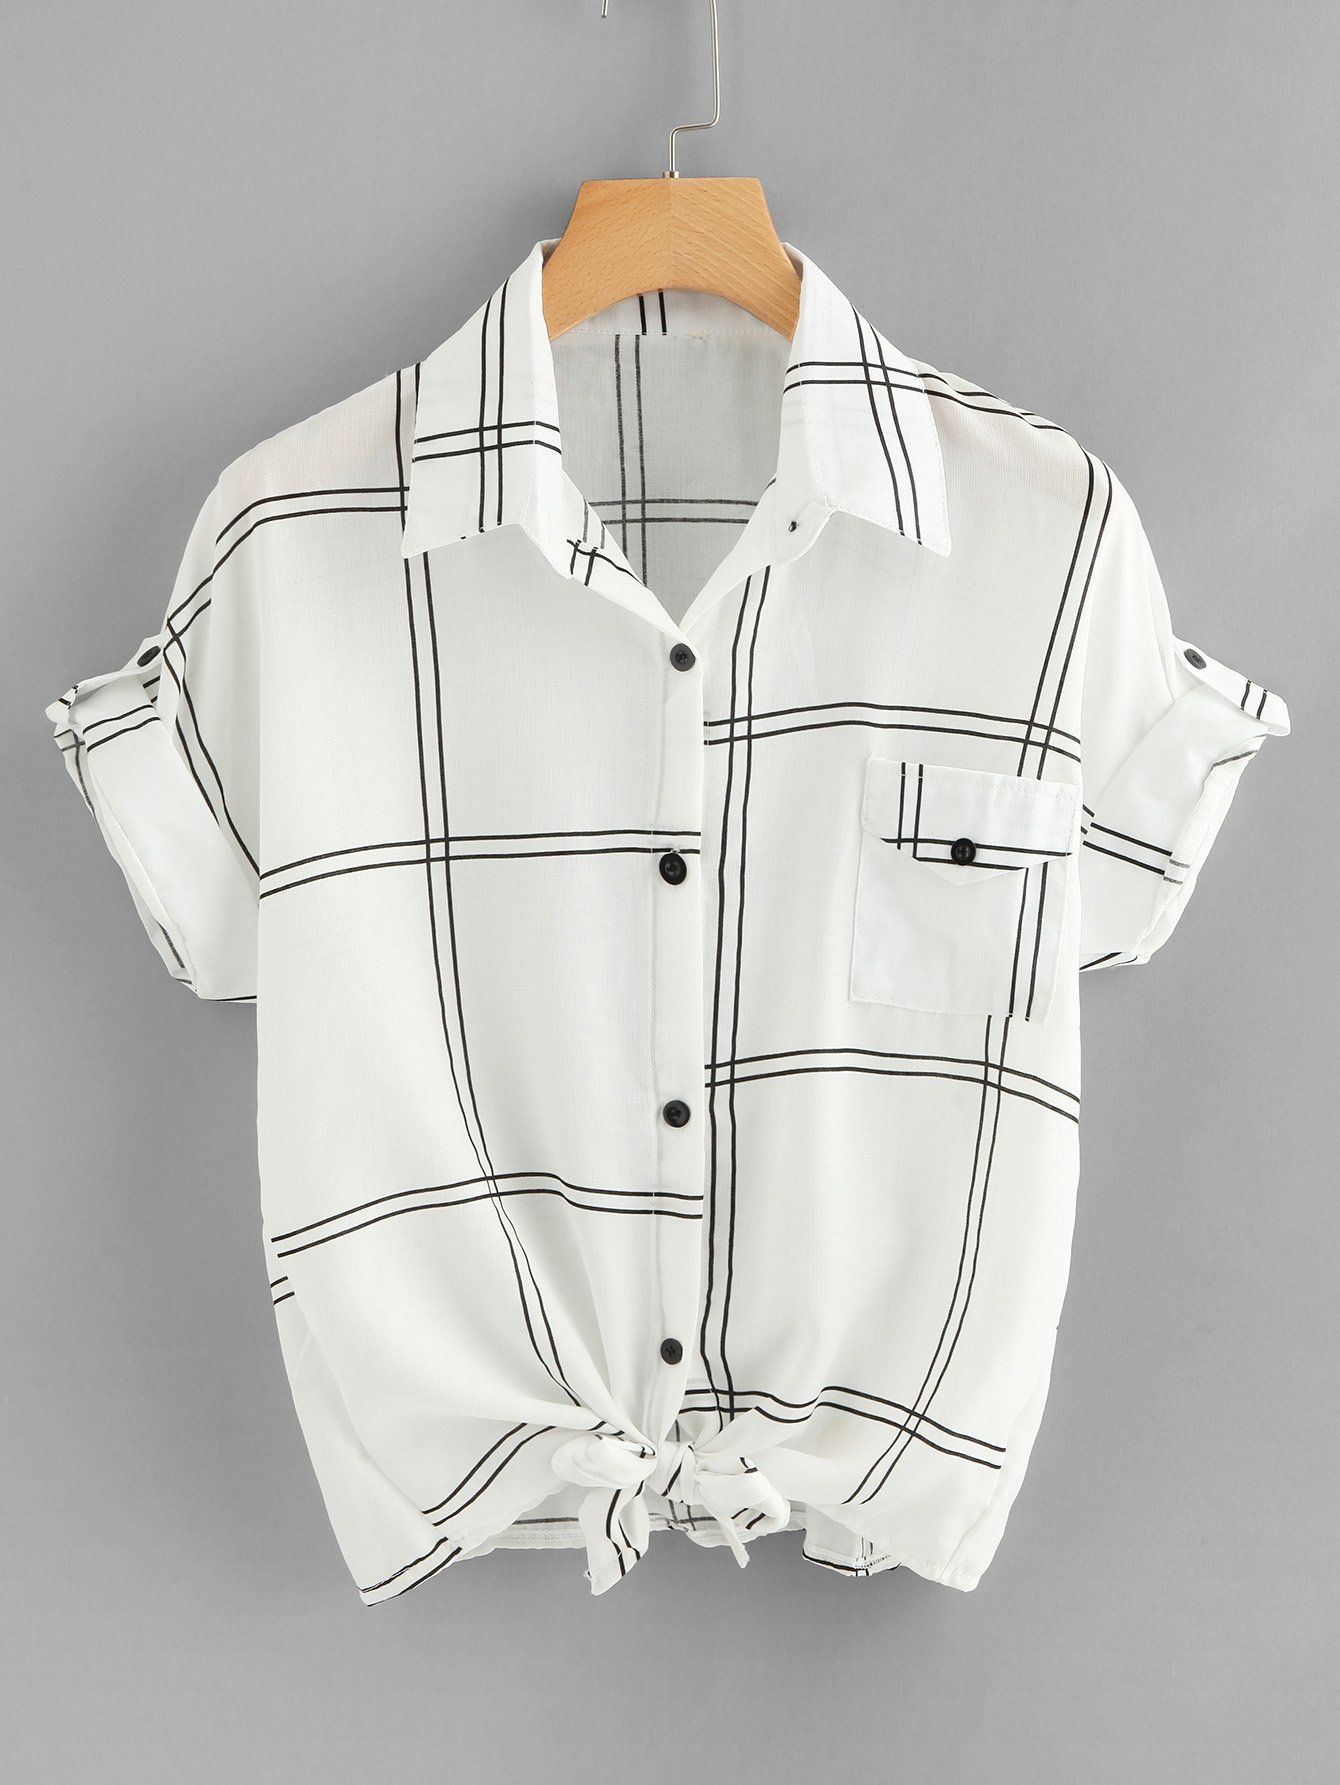 Knot Hem Plaid Shirt -SheIn(Sheinside)  6d157447717